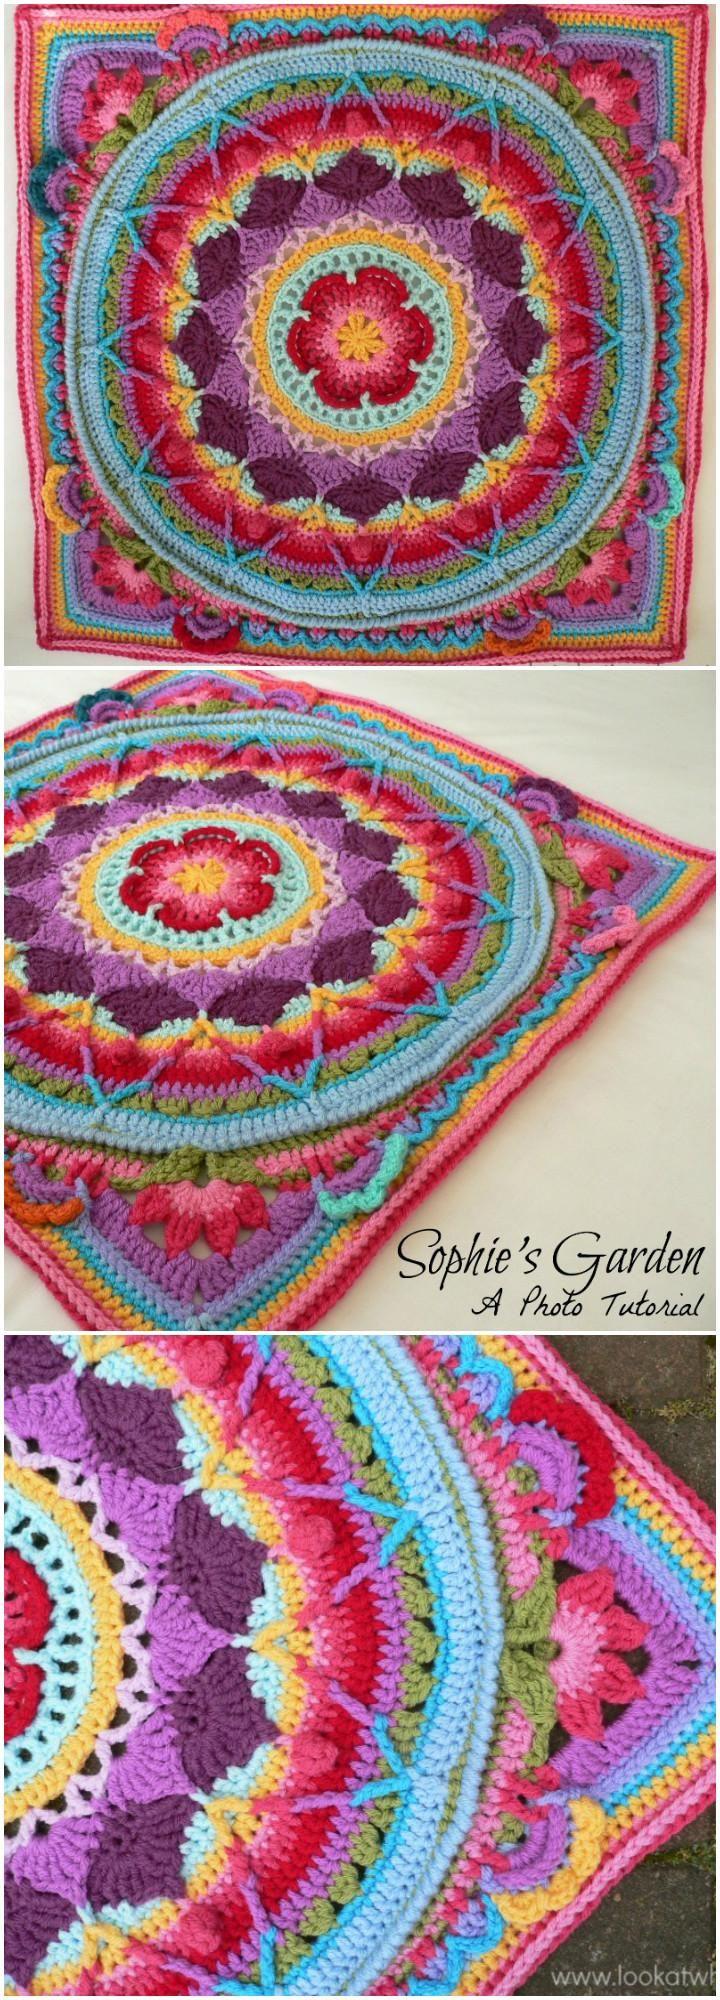 Sophie's Garden Crochet Mandala - 60 Free Crochet Mandala Patterns - DIY